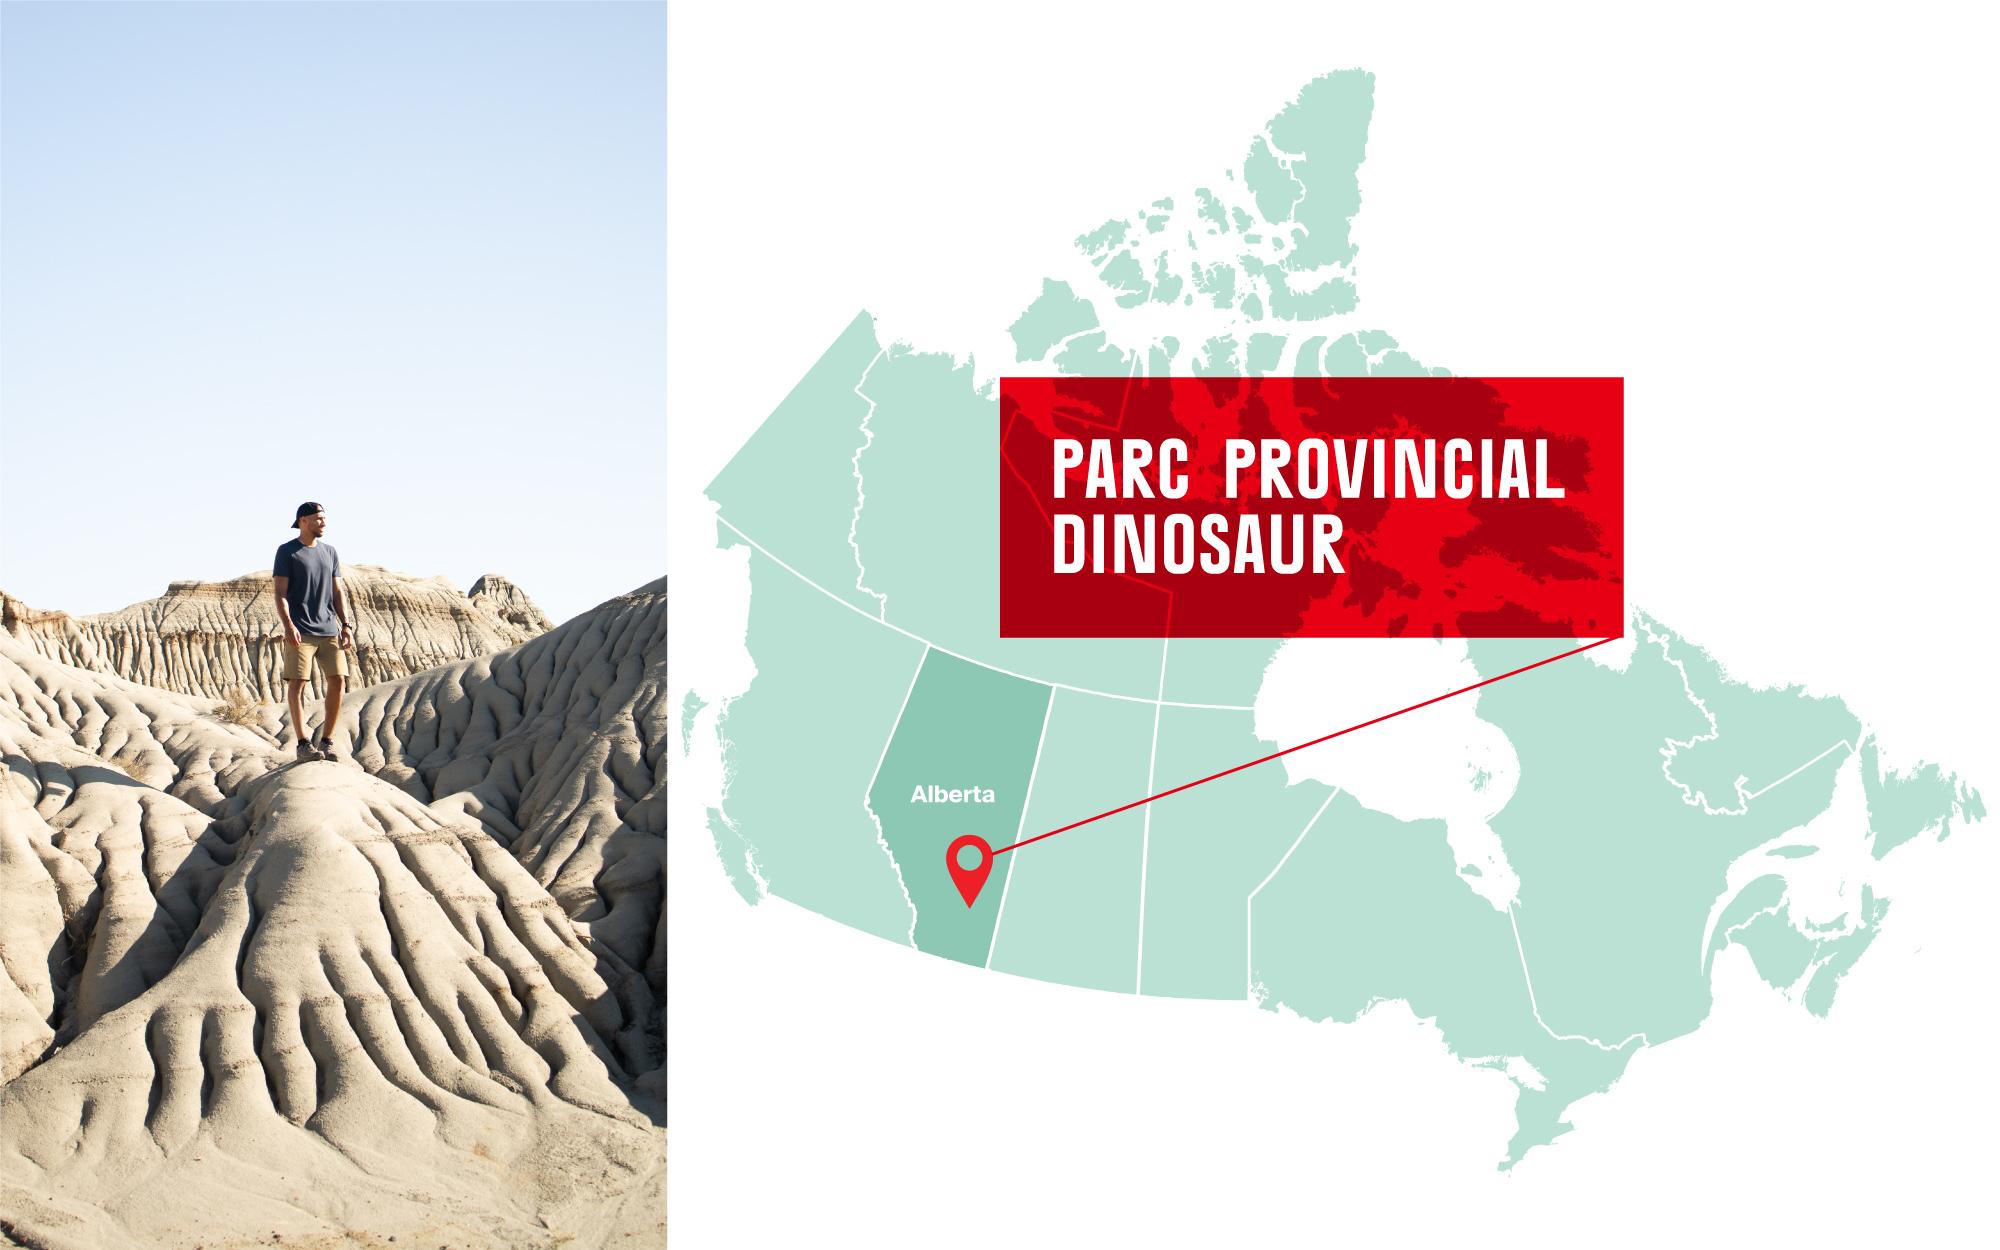 Source : Travel Alberta/Scott Bakken